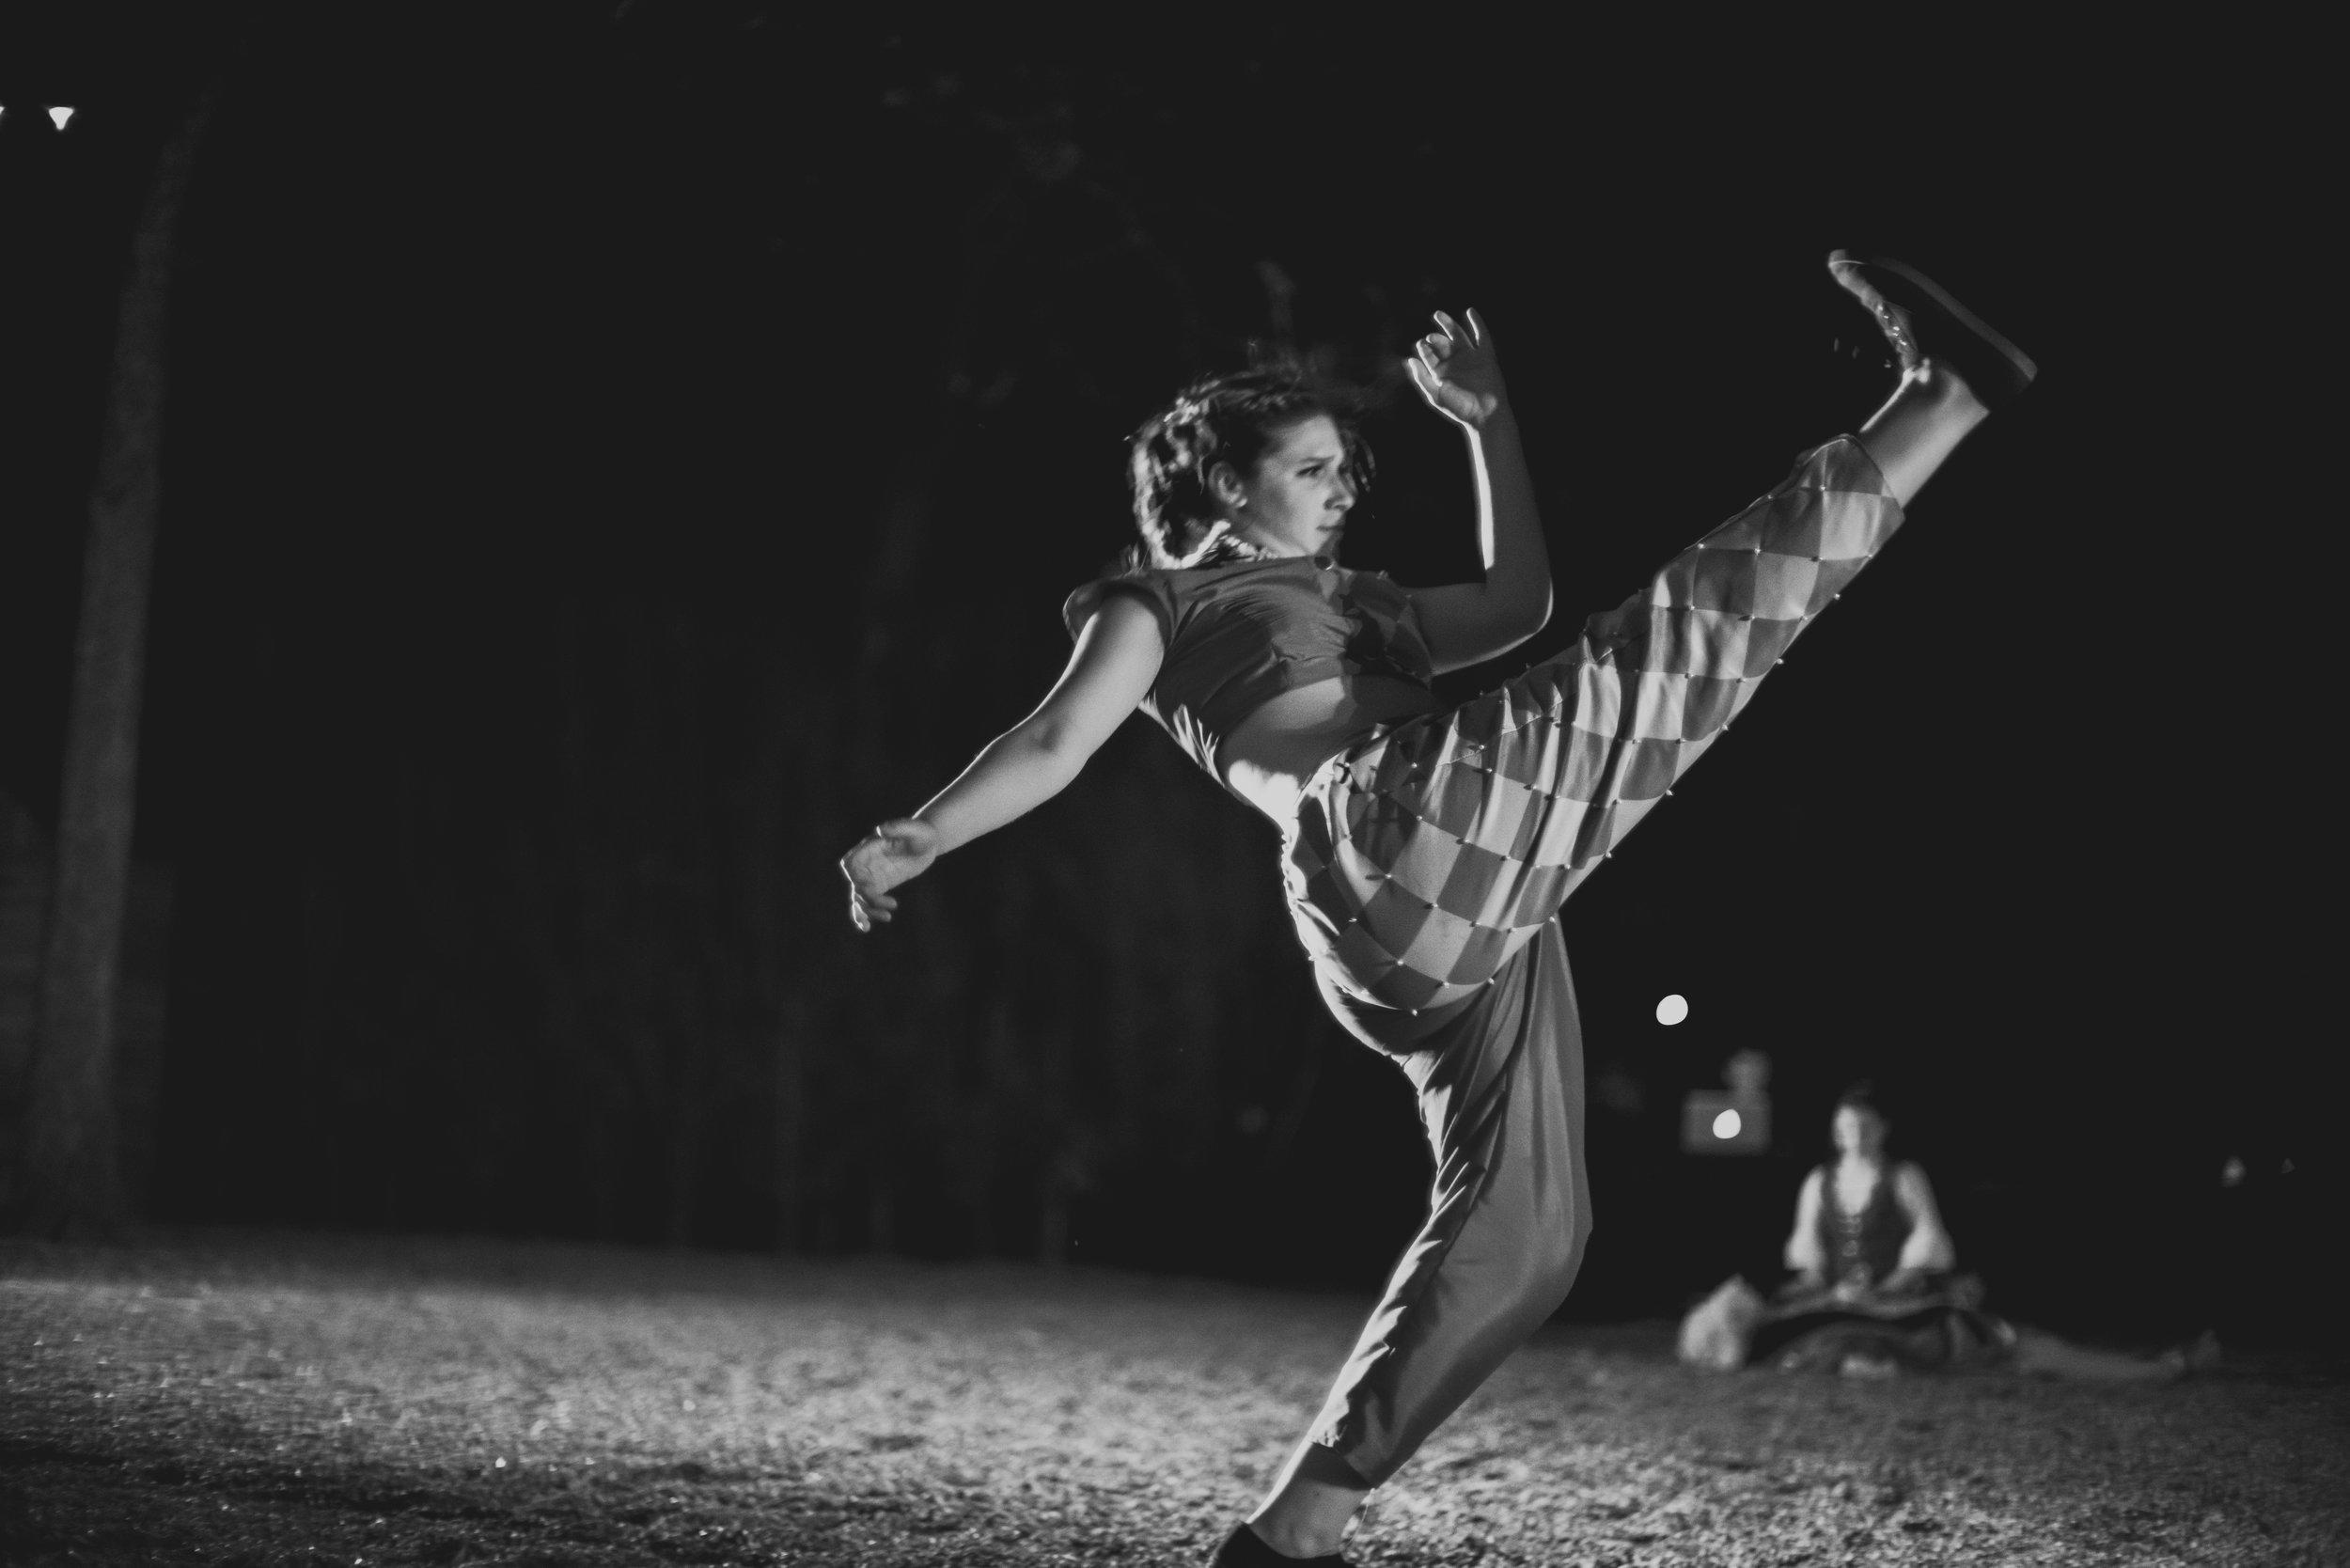 Dancer kicking at Austin event performance